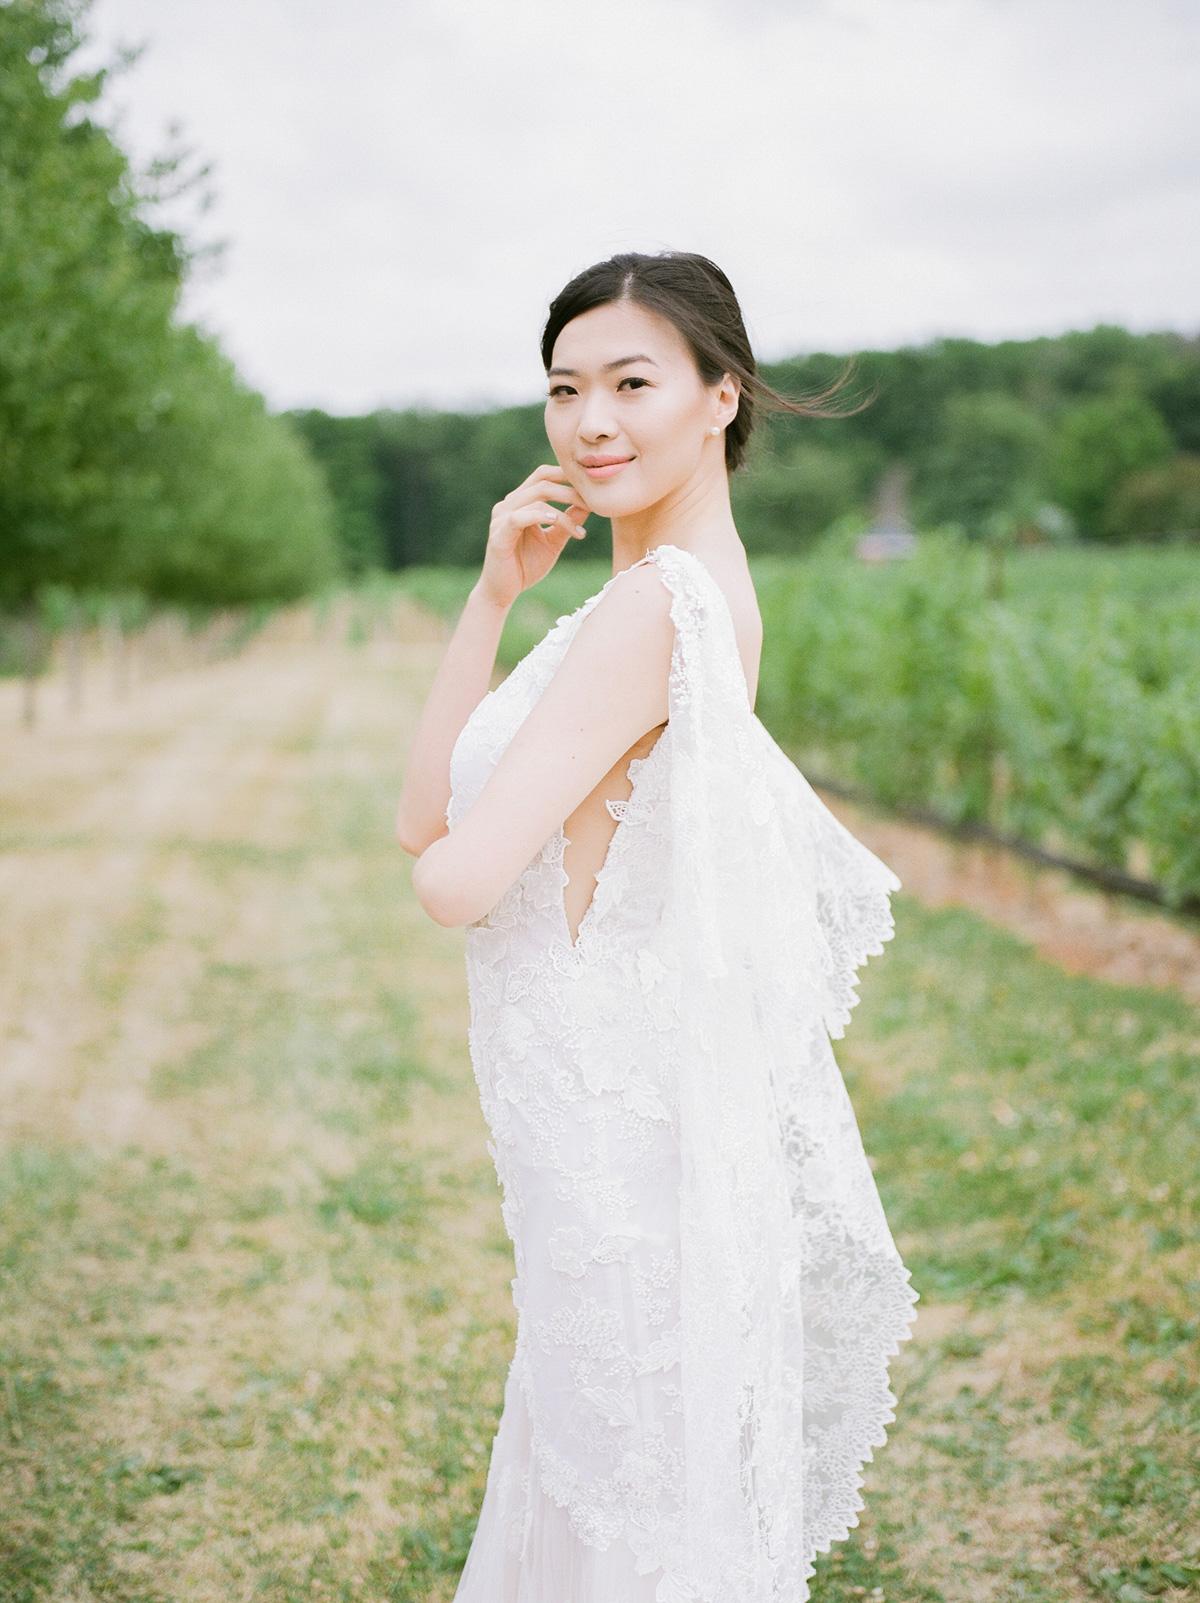 jennifer-xu-photography-vineyard-bride-swish-list-rosewod-eatstes-winery-beamsville-wedding-editorial-2.jpg